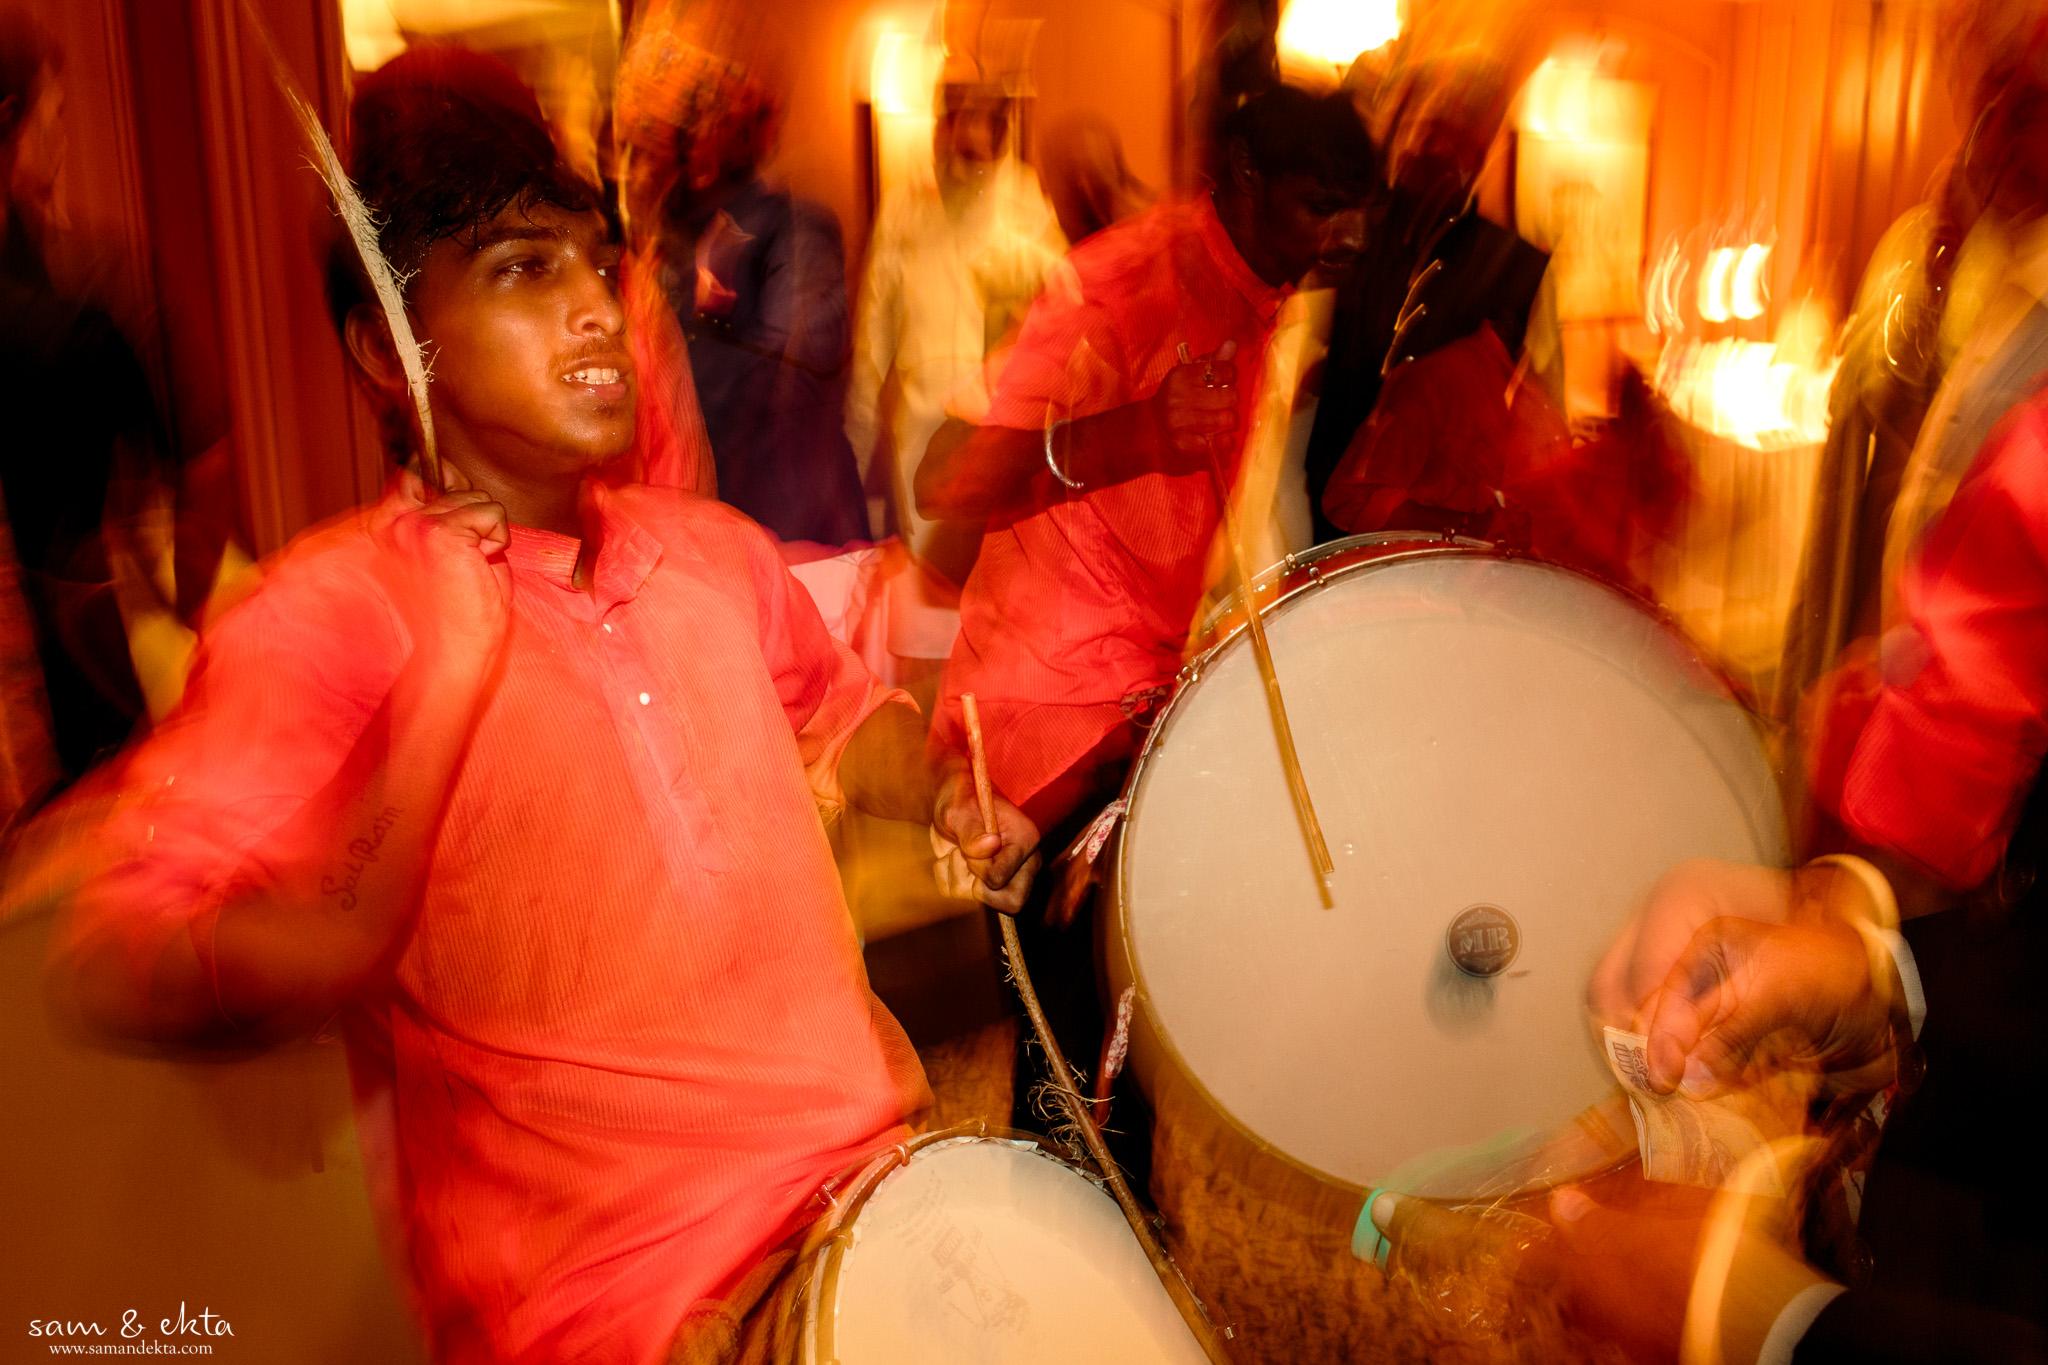 A&G_www.samandekta.com-67.jpg